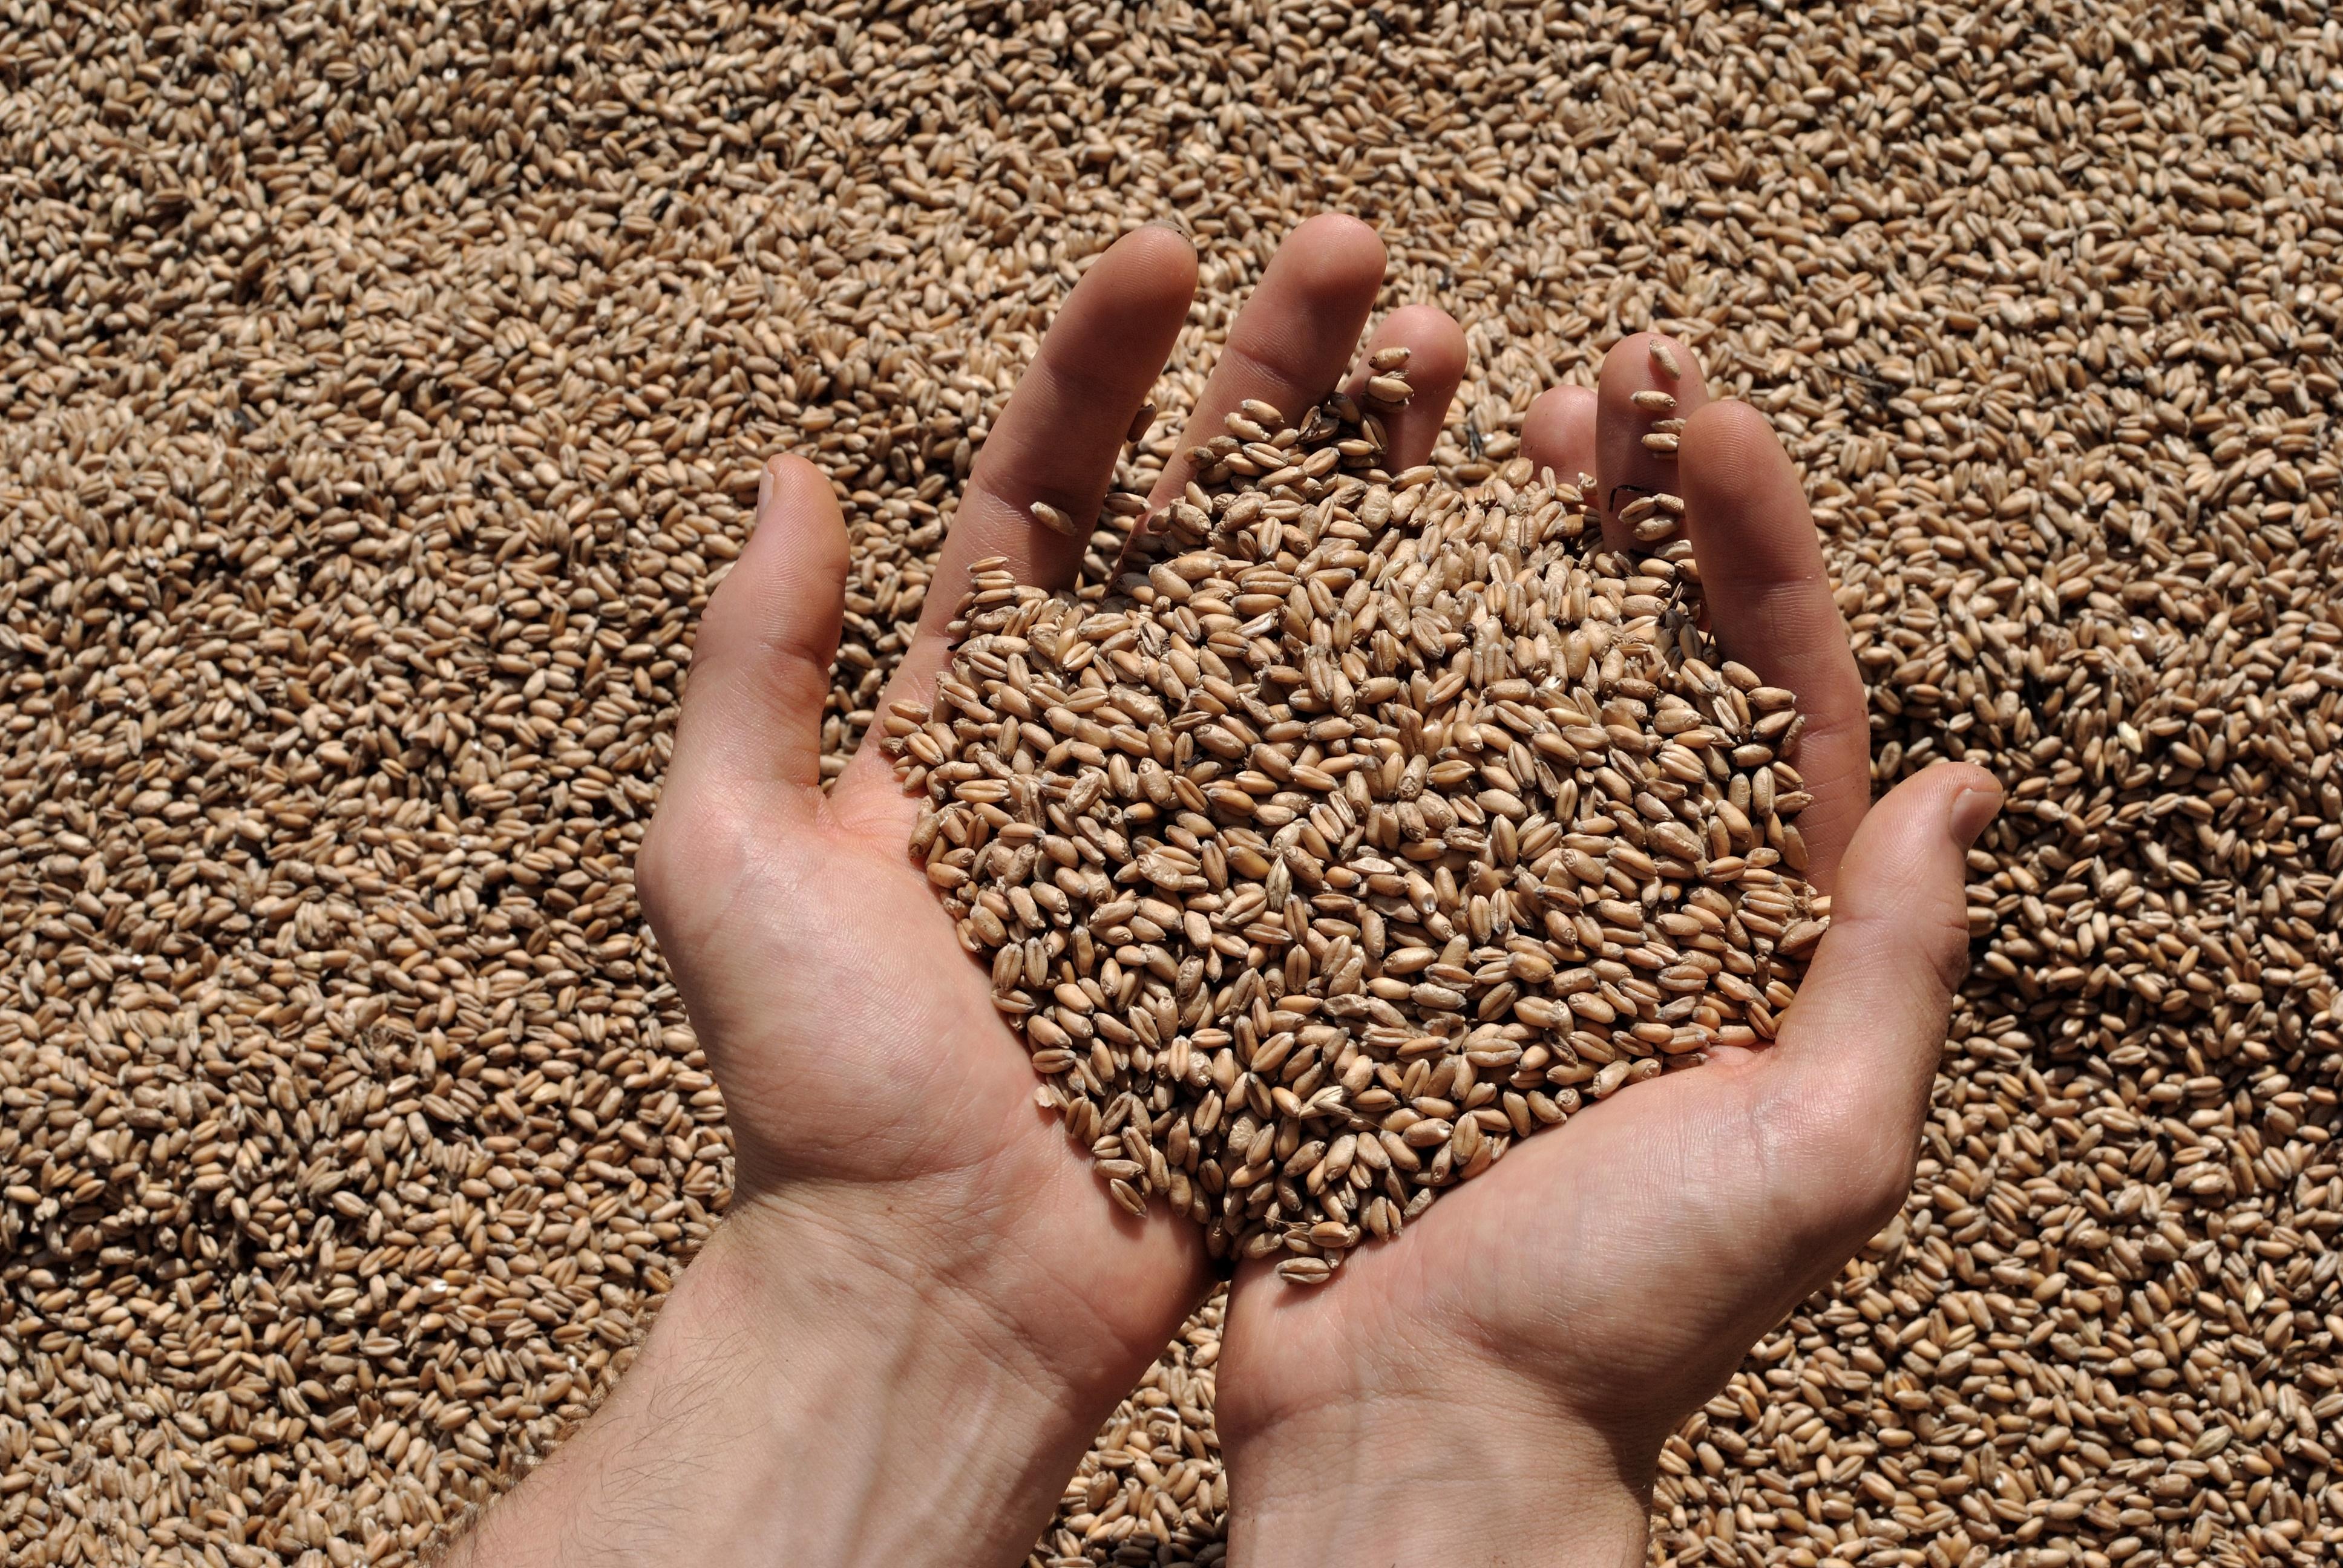 Wheat_grain_adobestock_867325661